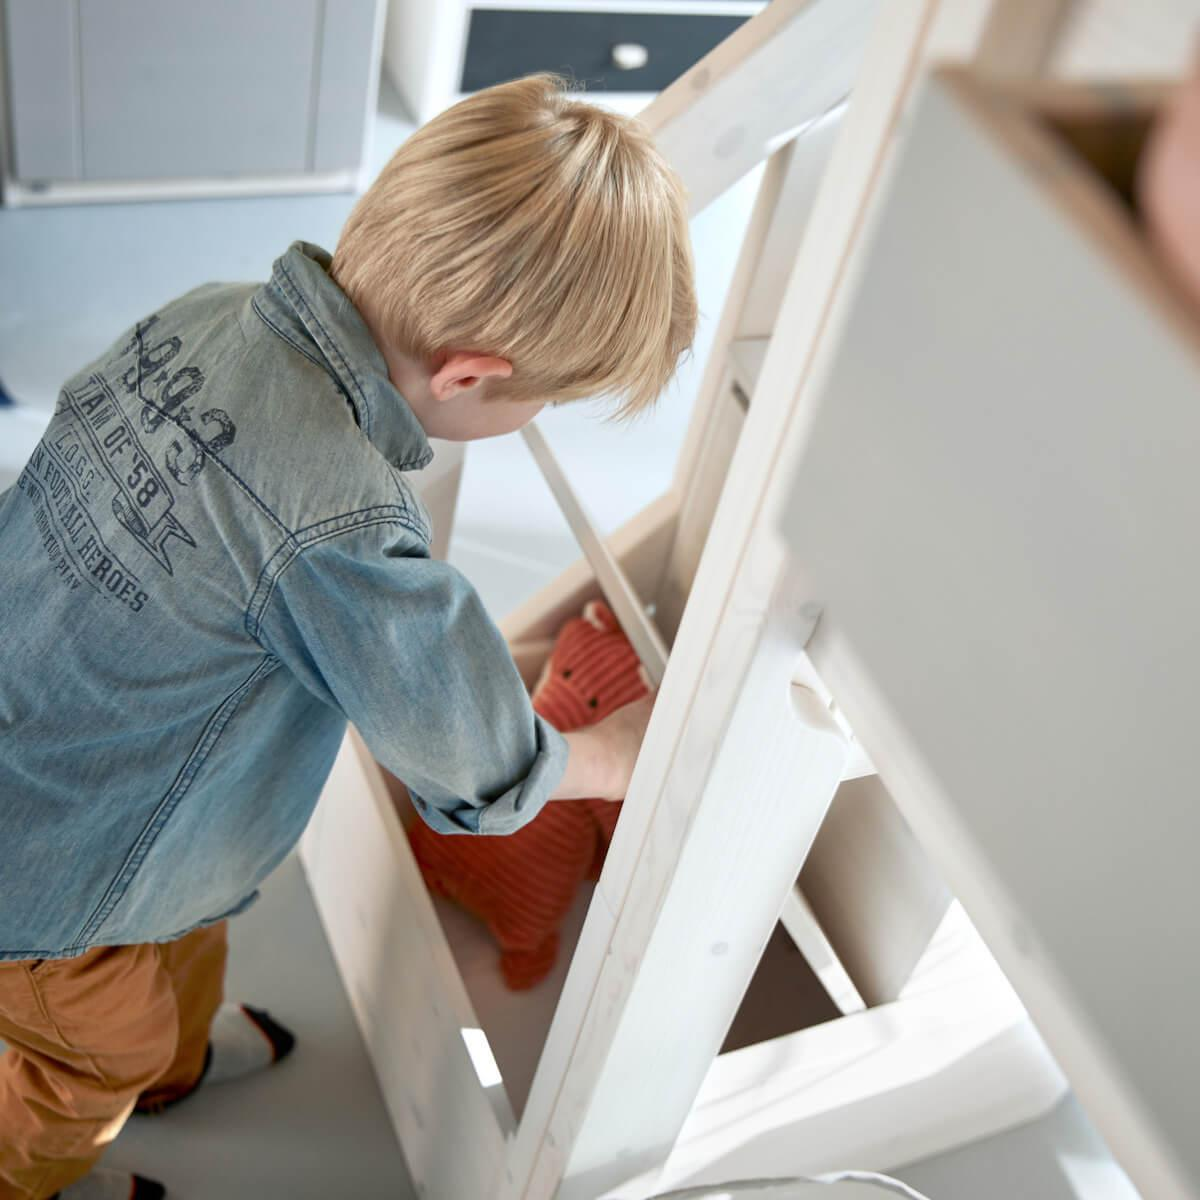 Cama cabaña semi-alta 90x200cm THE HIDEOUT escalera cajones Lifetime blanqueado